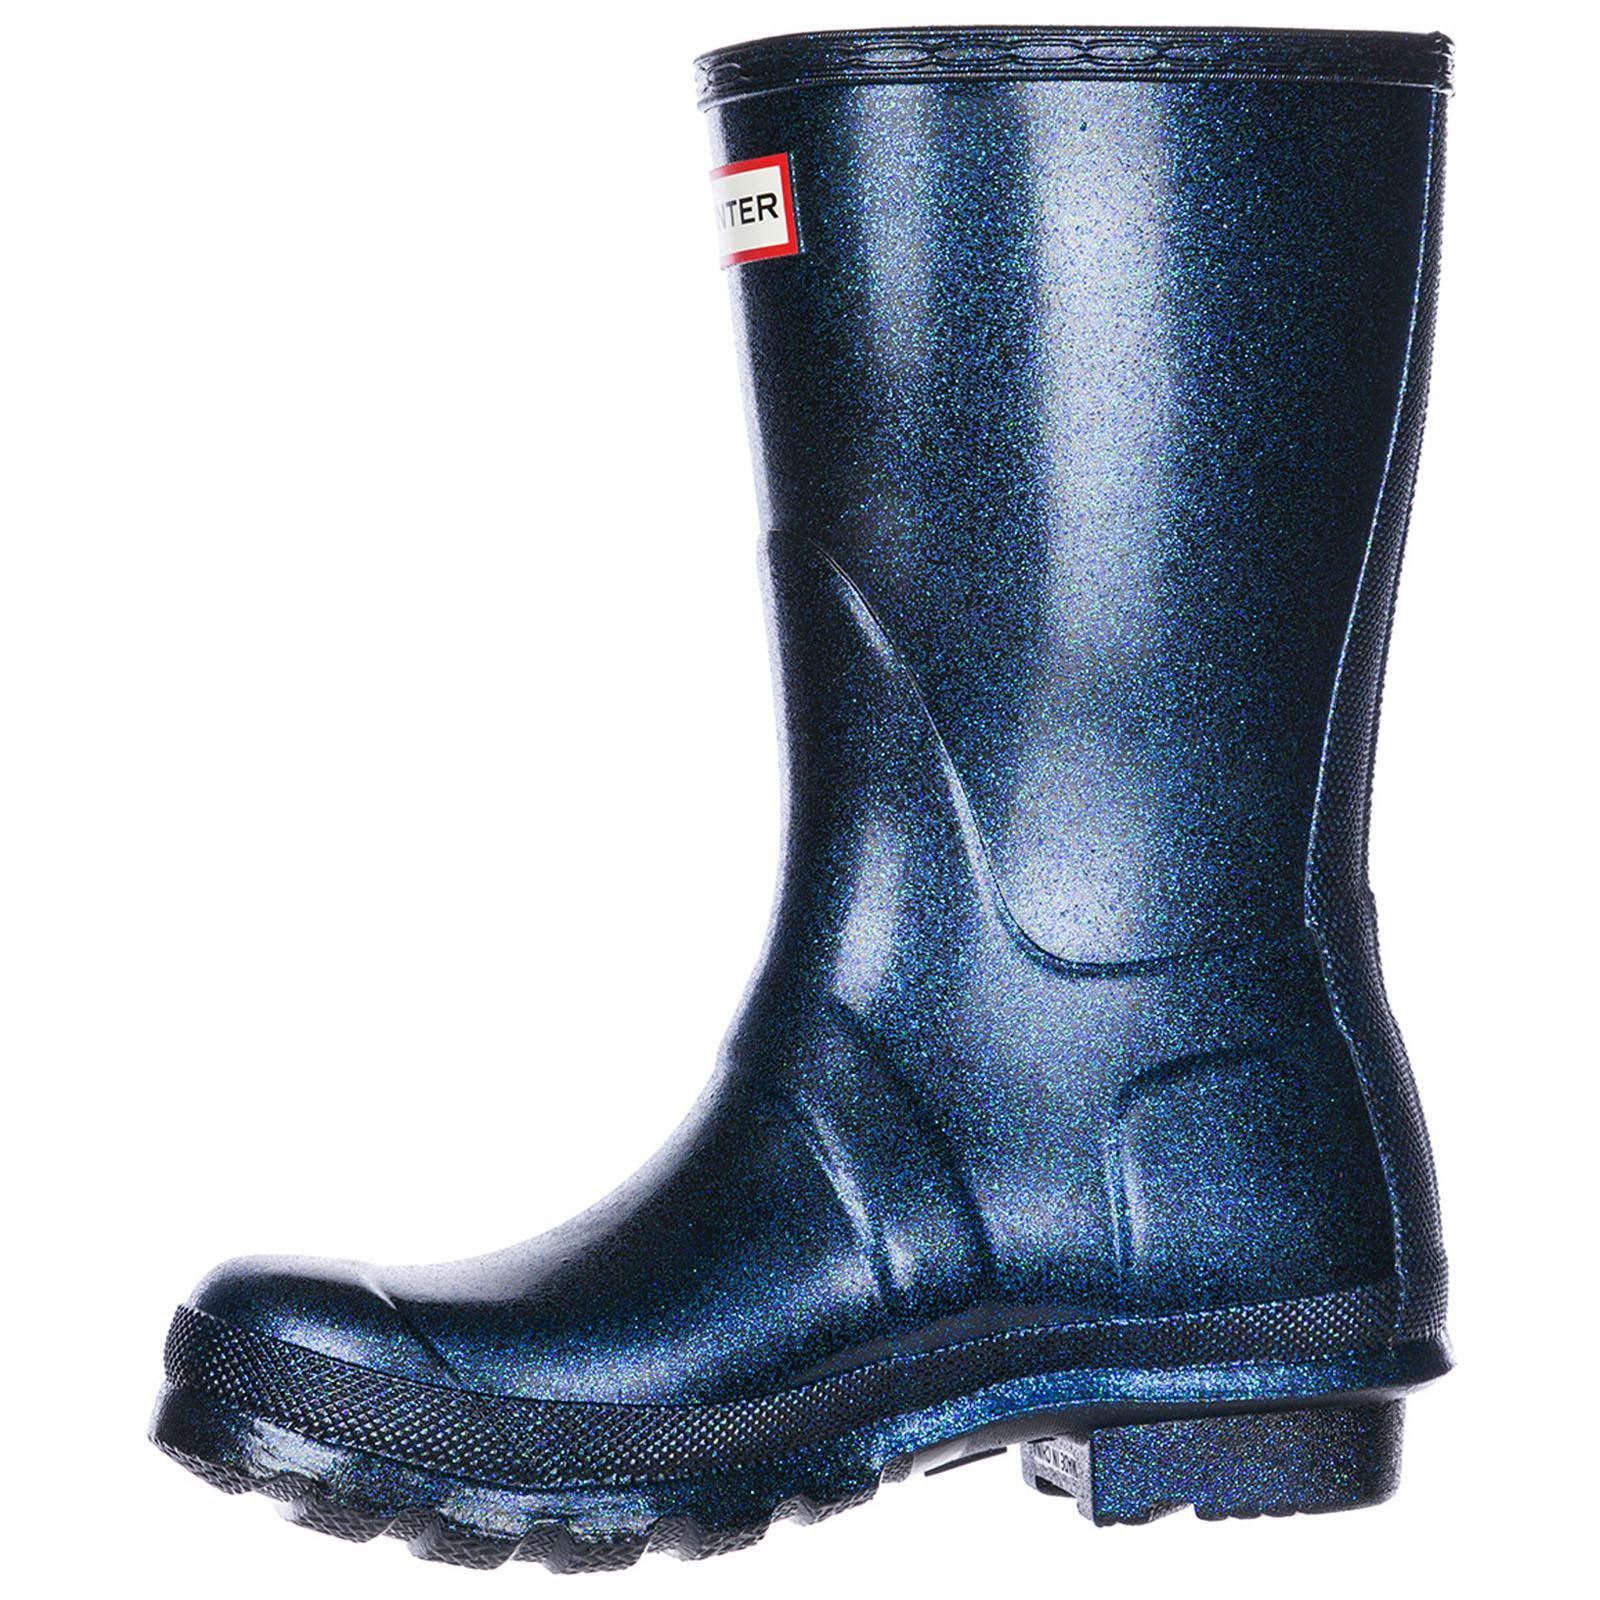 Women's rubber rain boots wellington short starcloud